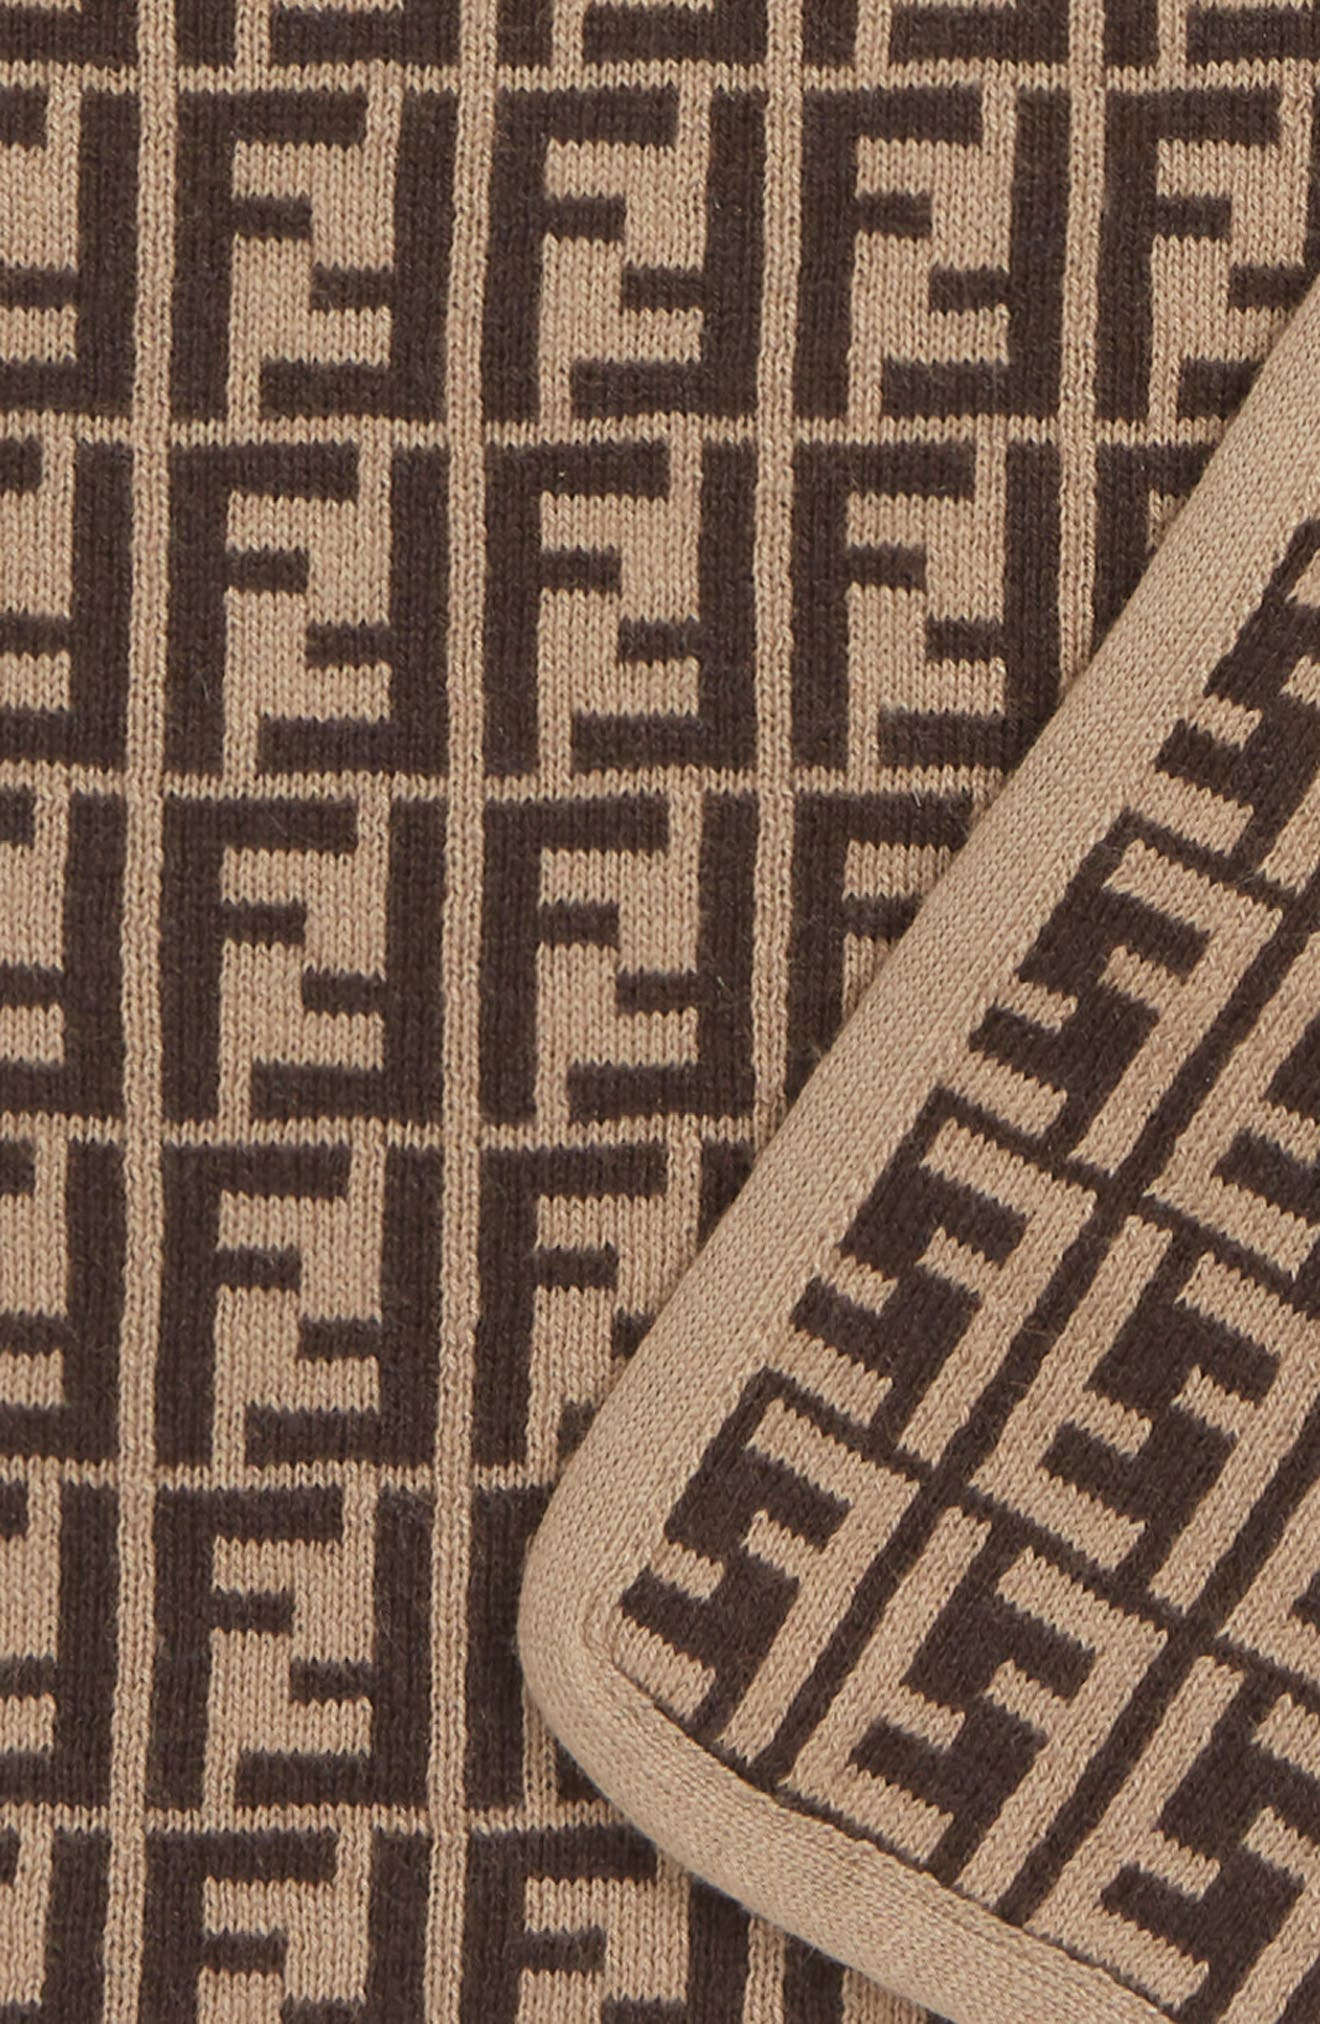 FENDI,                             Logo Cotton & Cashmere Baby Blanket,                             Alternate thumbnail 2, color,                             BUJ101 A3TE